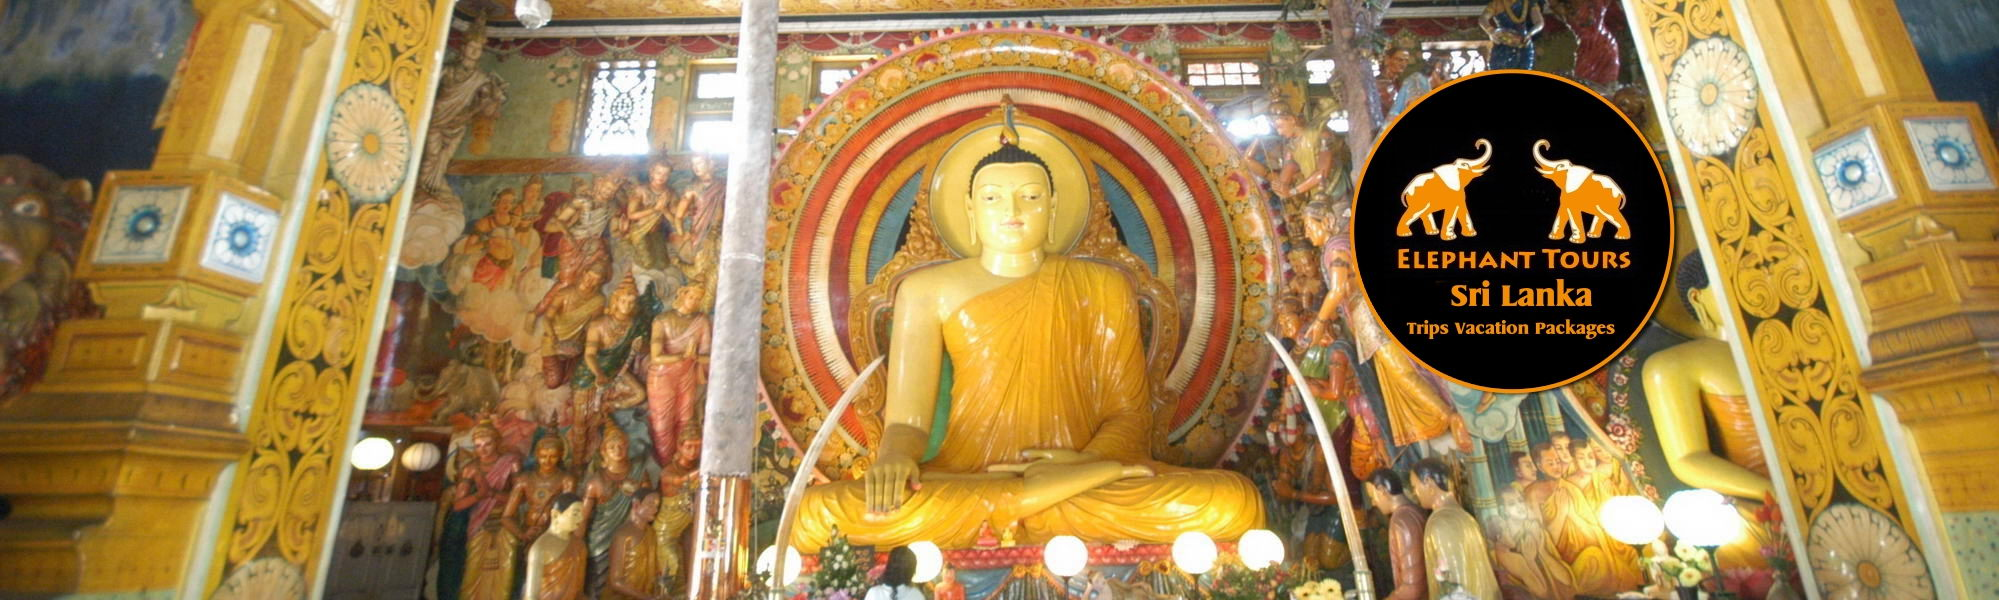 Sri-Lanka-Buddha-Statue